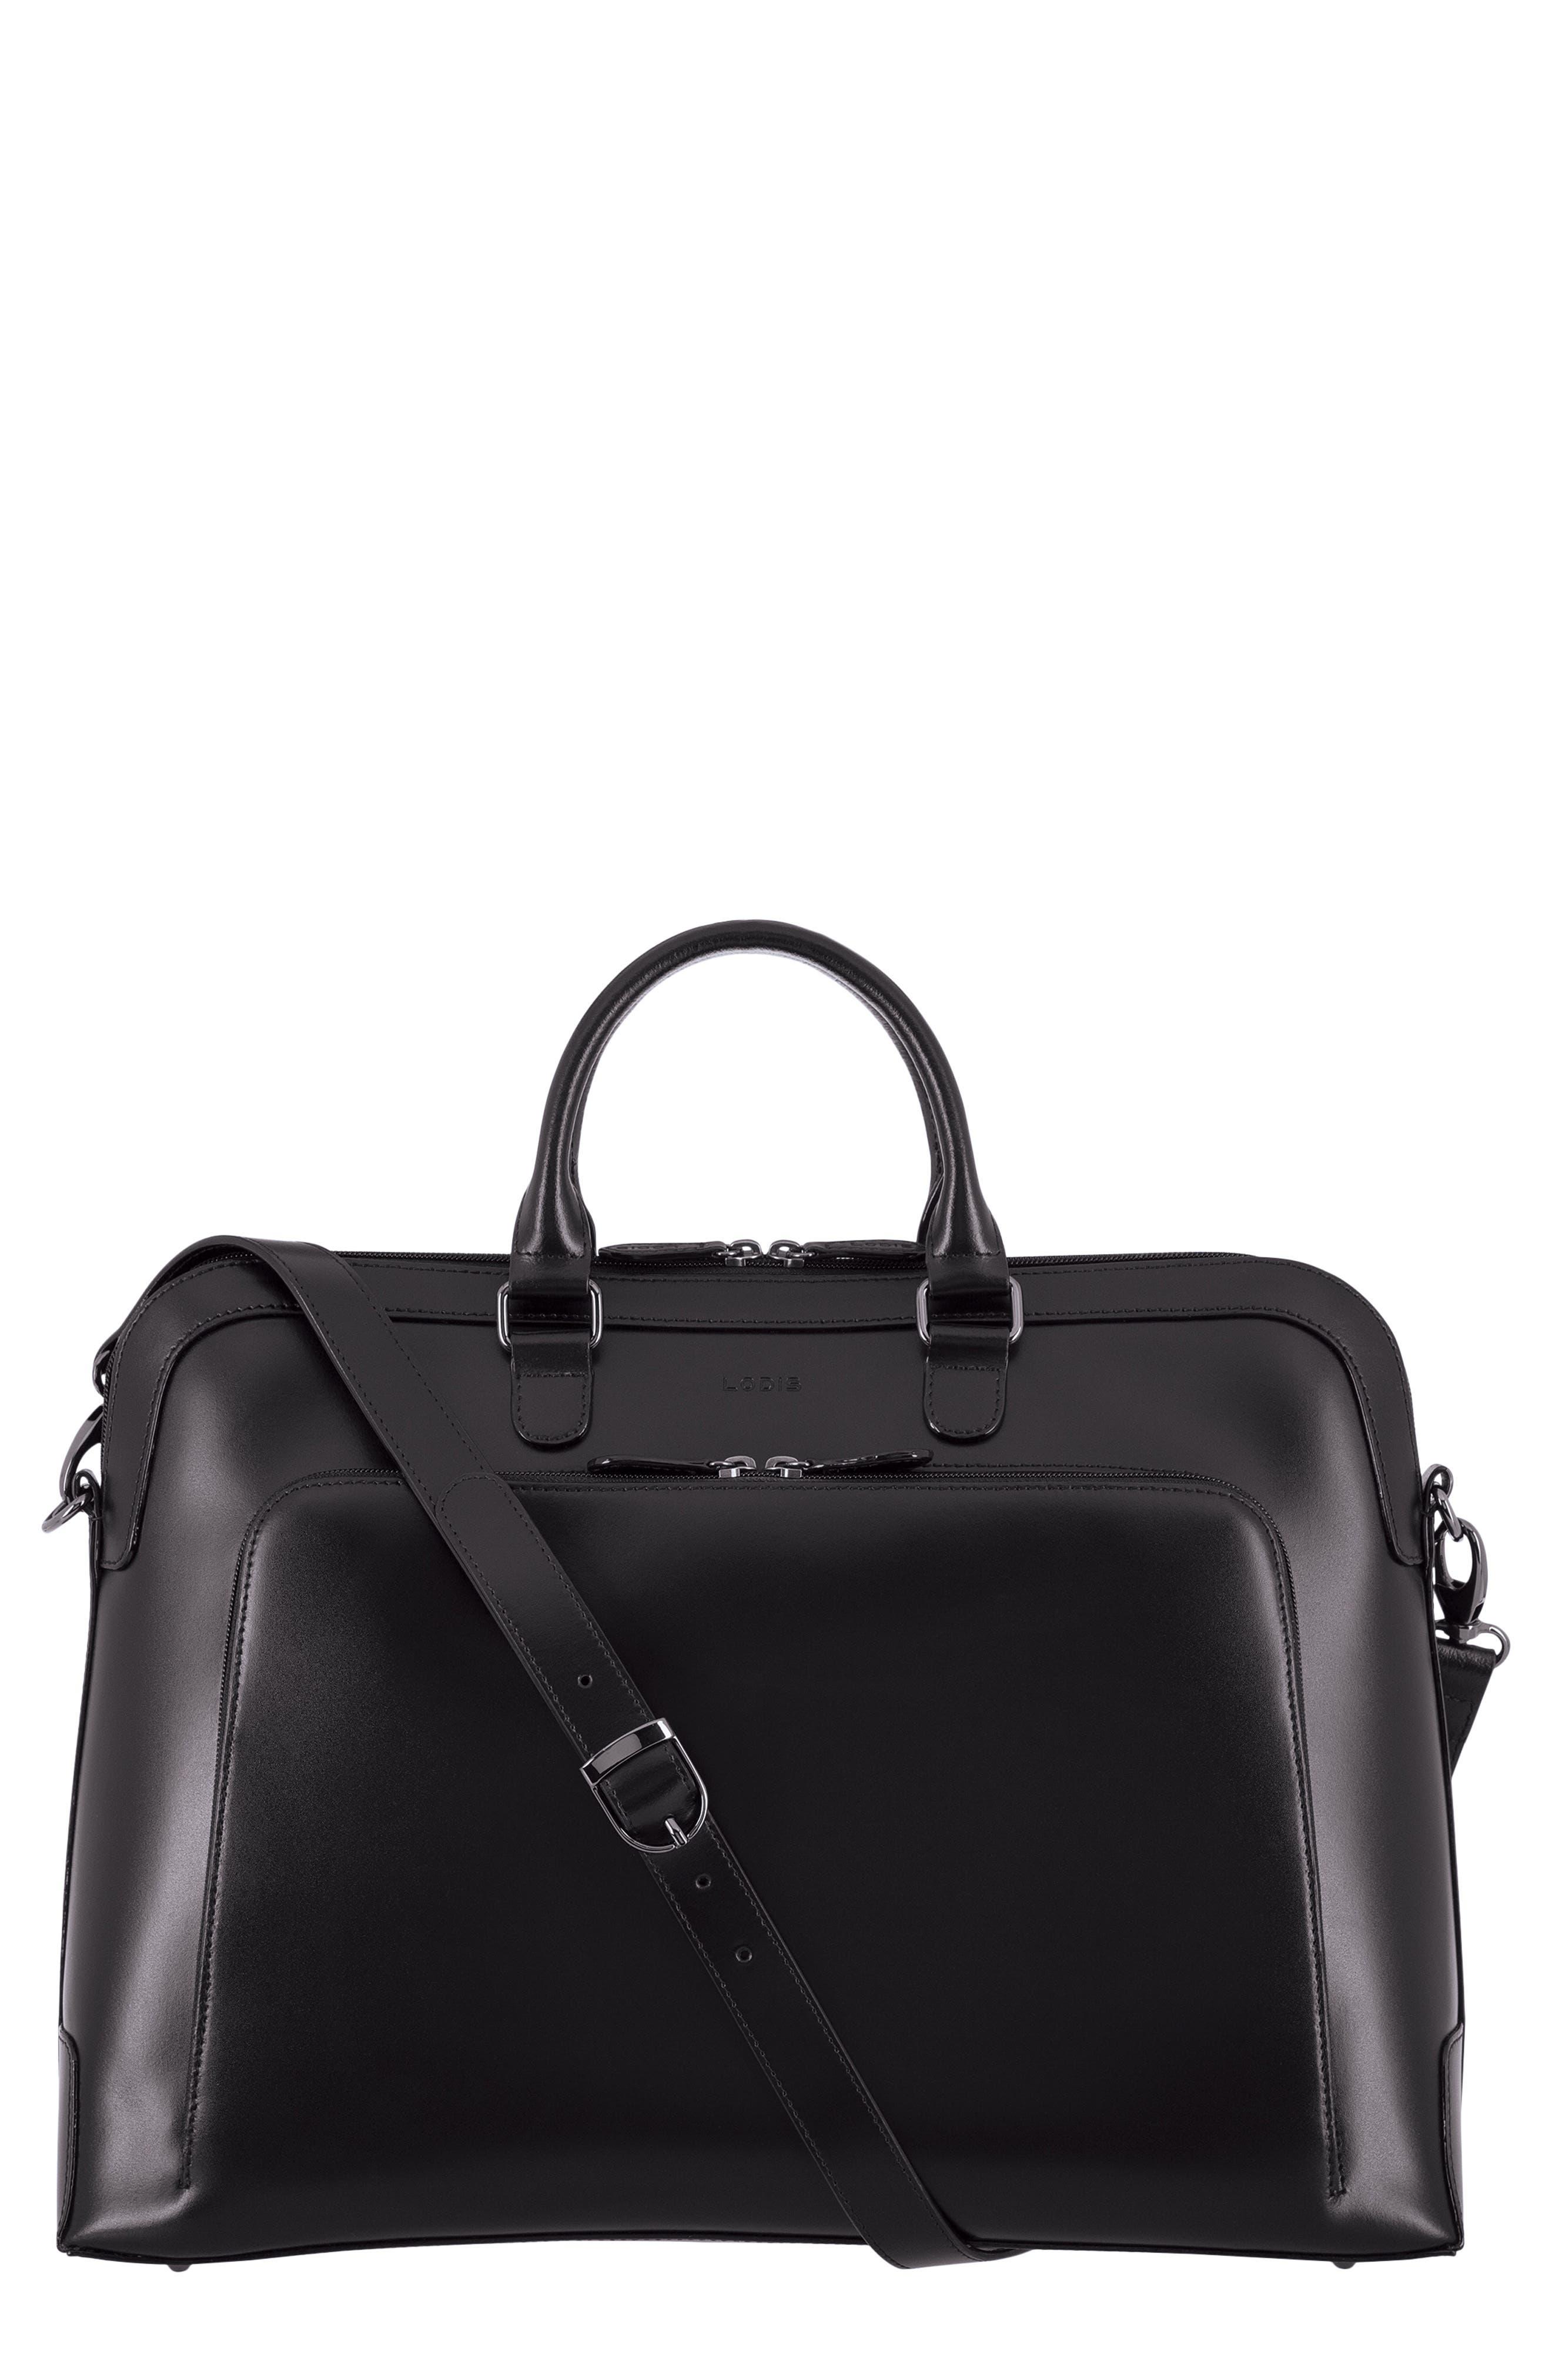 Audrey Under Lock & Key - Brera RFID Leather Briefcase,                             Main thumbnail 1, color,                             BLACK/ BLACK